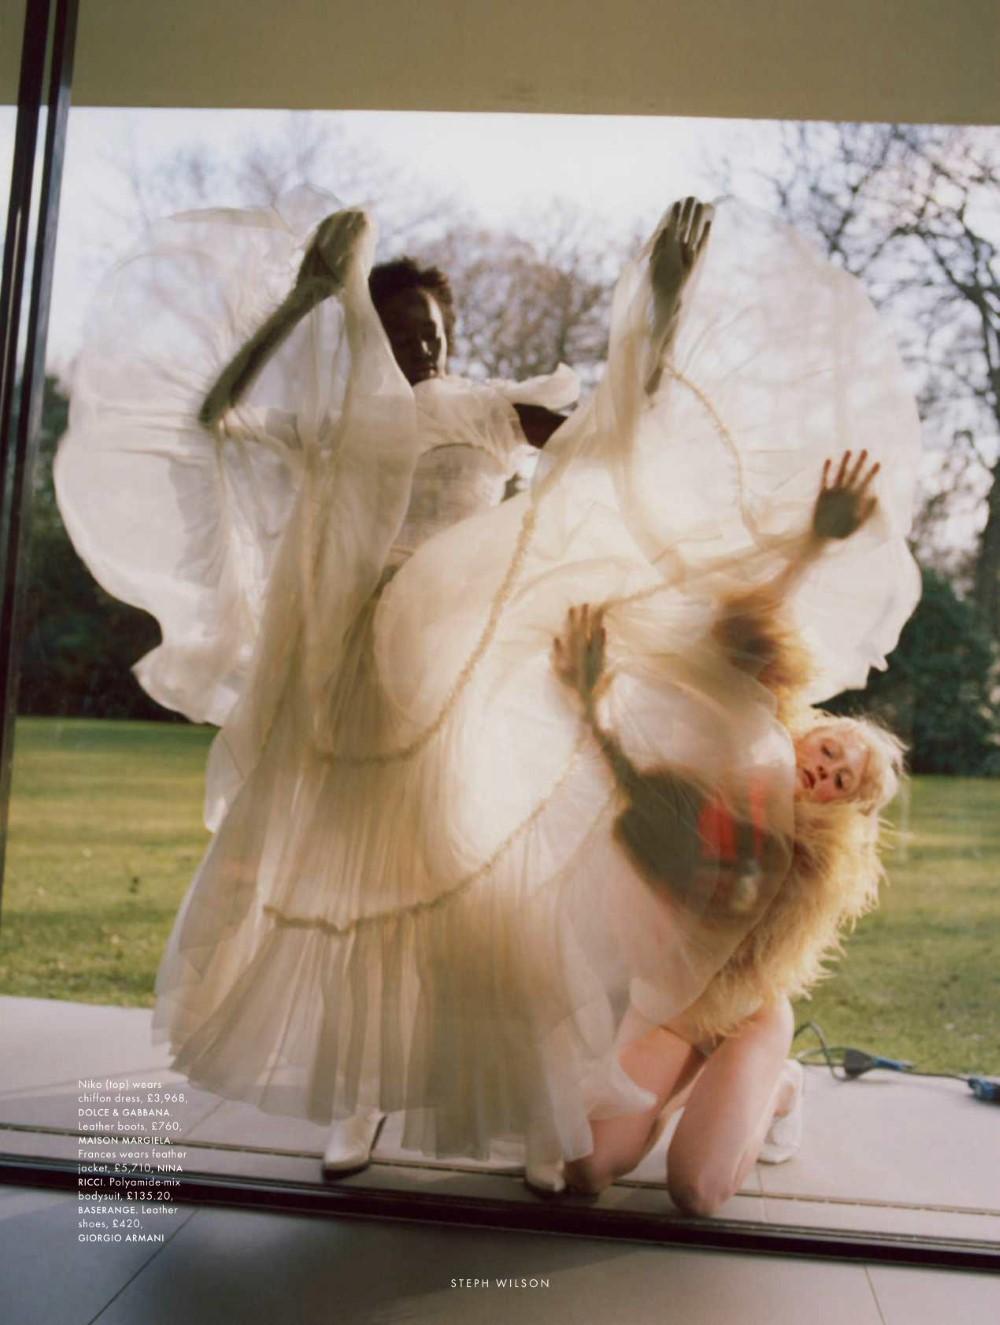 Steph Wilson Beyond the Pale Elle UK (9).jpg